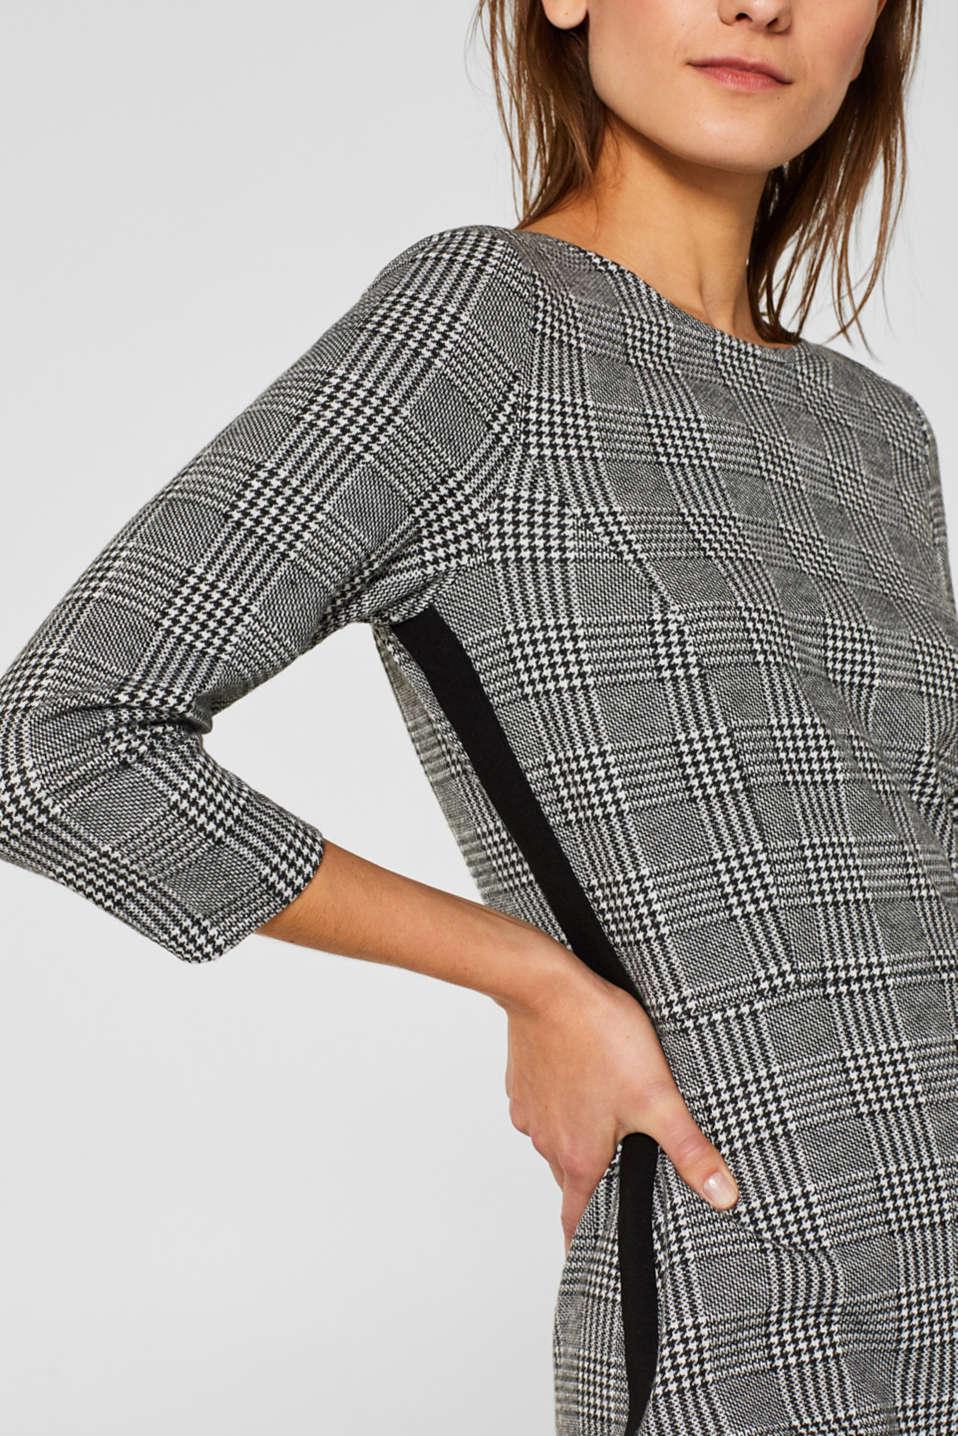 Dresses knitted, BLACK 2, detail image number 3